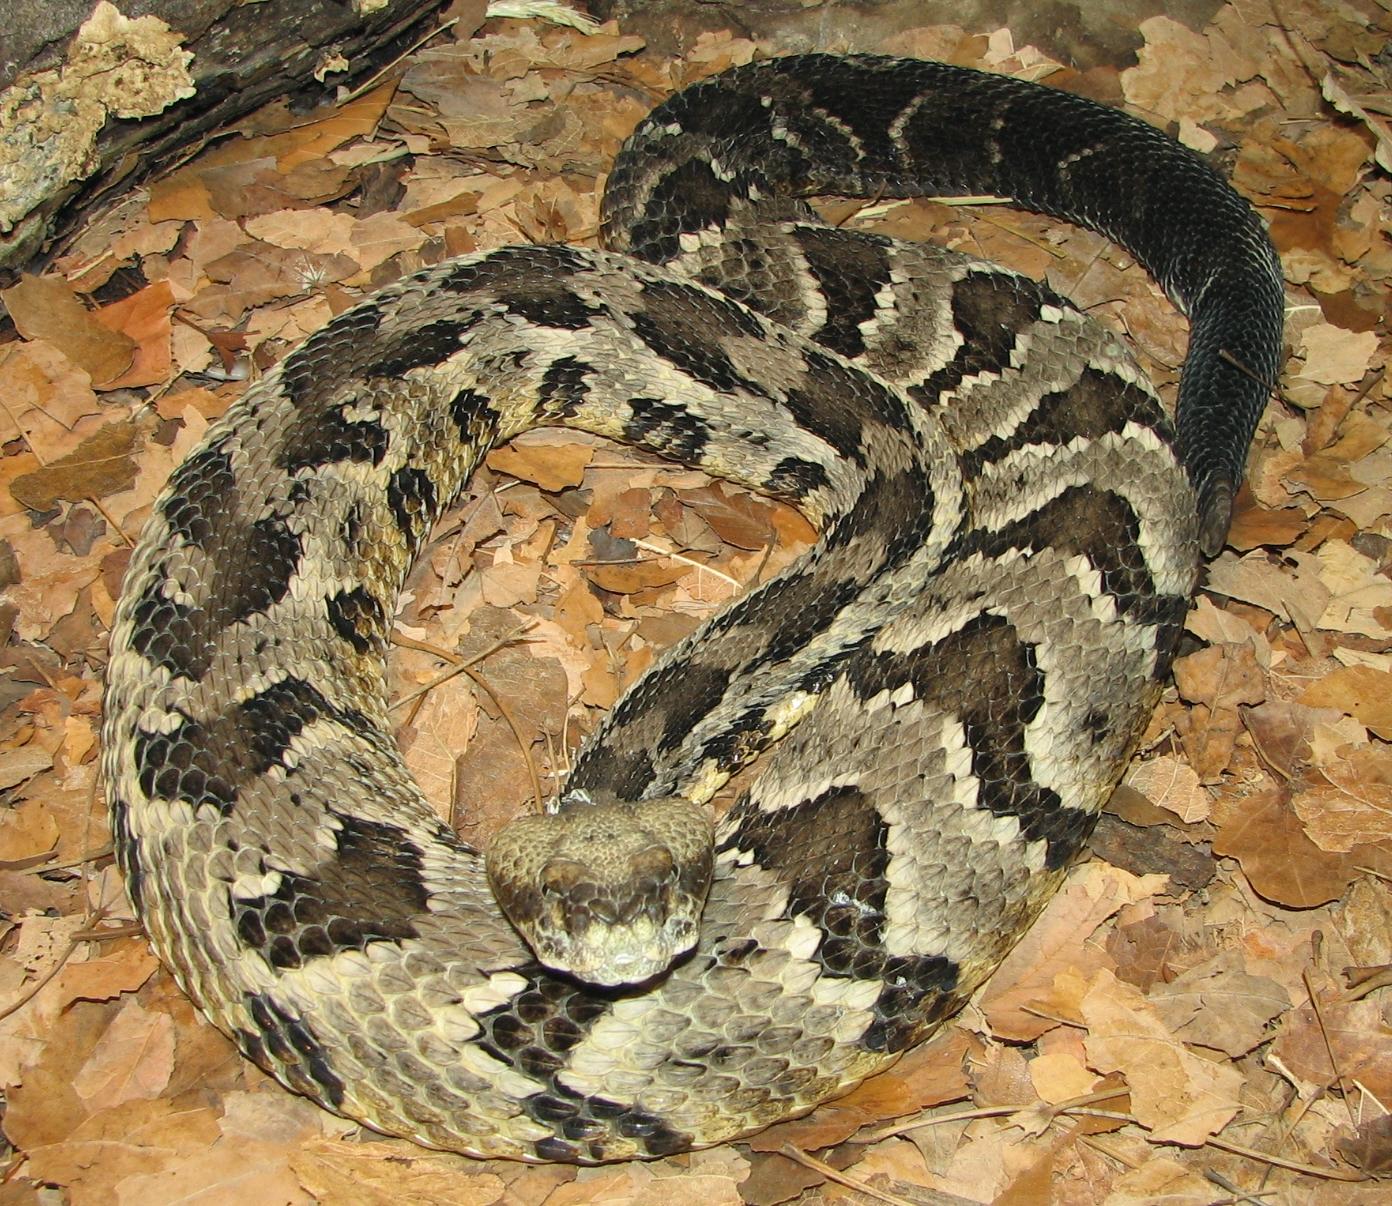 Alabama black snake 5 1